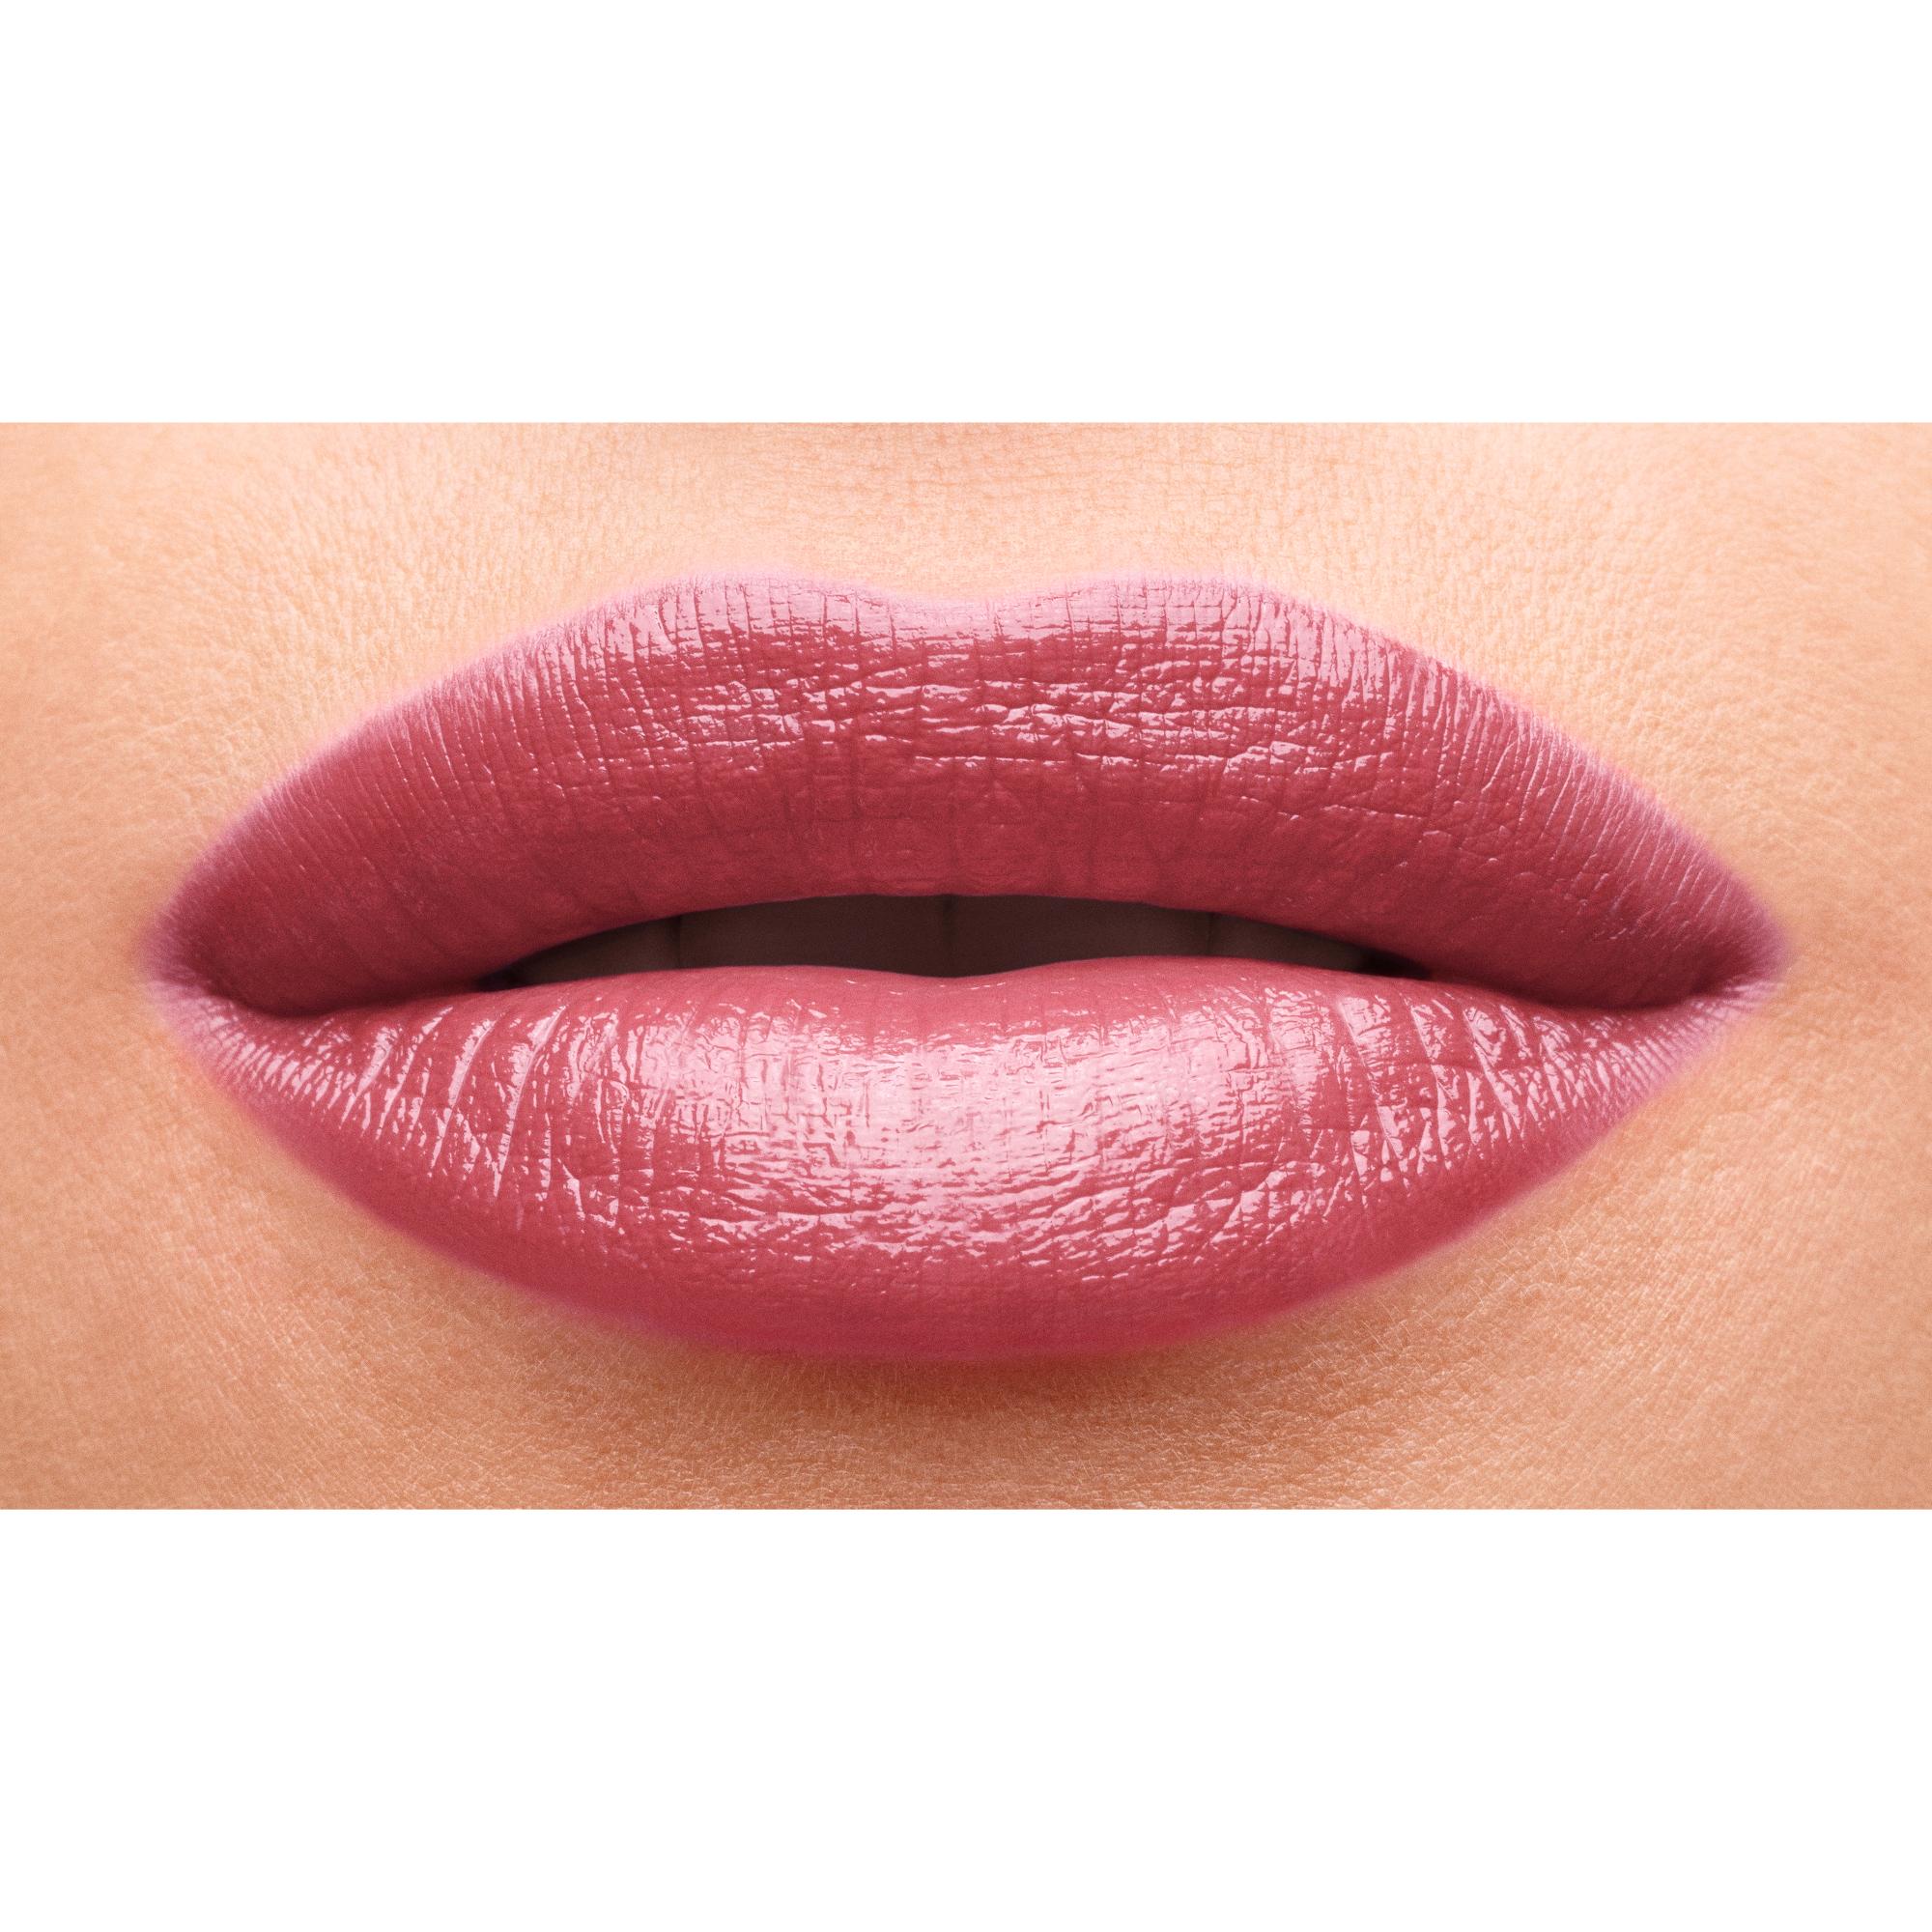 Yves Saint Laurent Rouge Pur Couture Lipstick, 9 rose stiletto